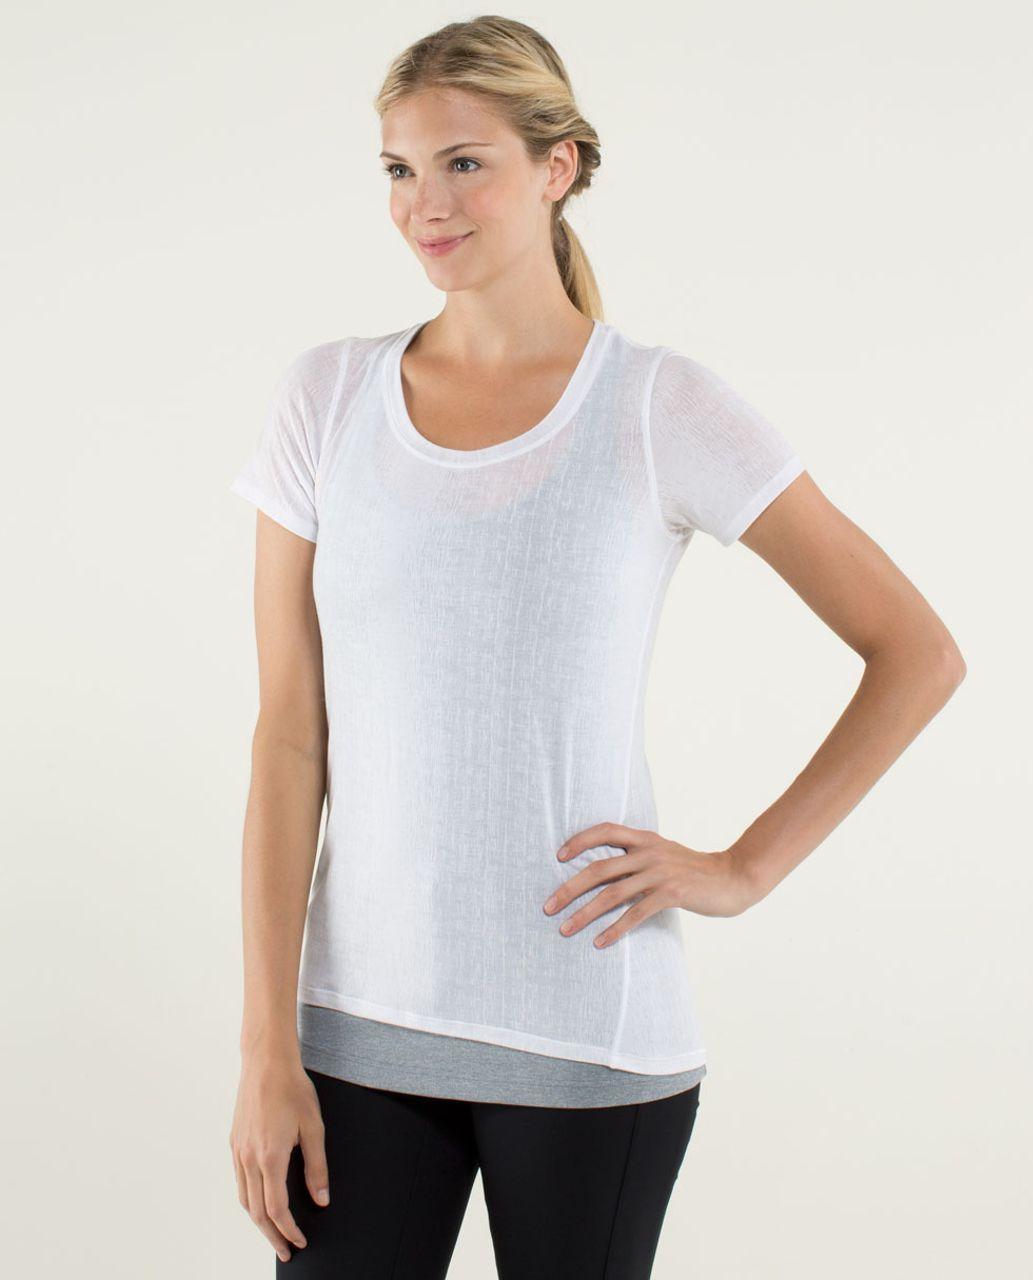 Lululemon Just Be Short Sleeve Tee - Misty Stripe Burnout White